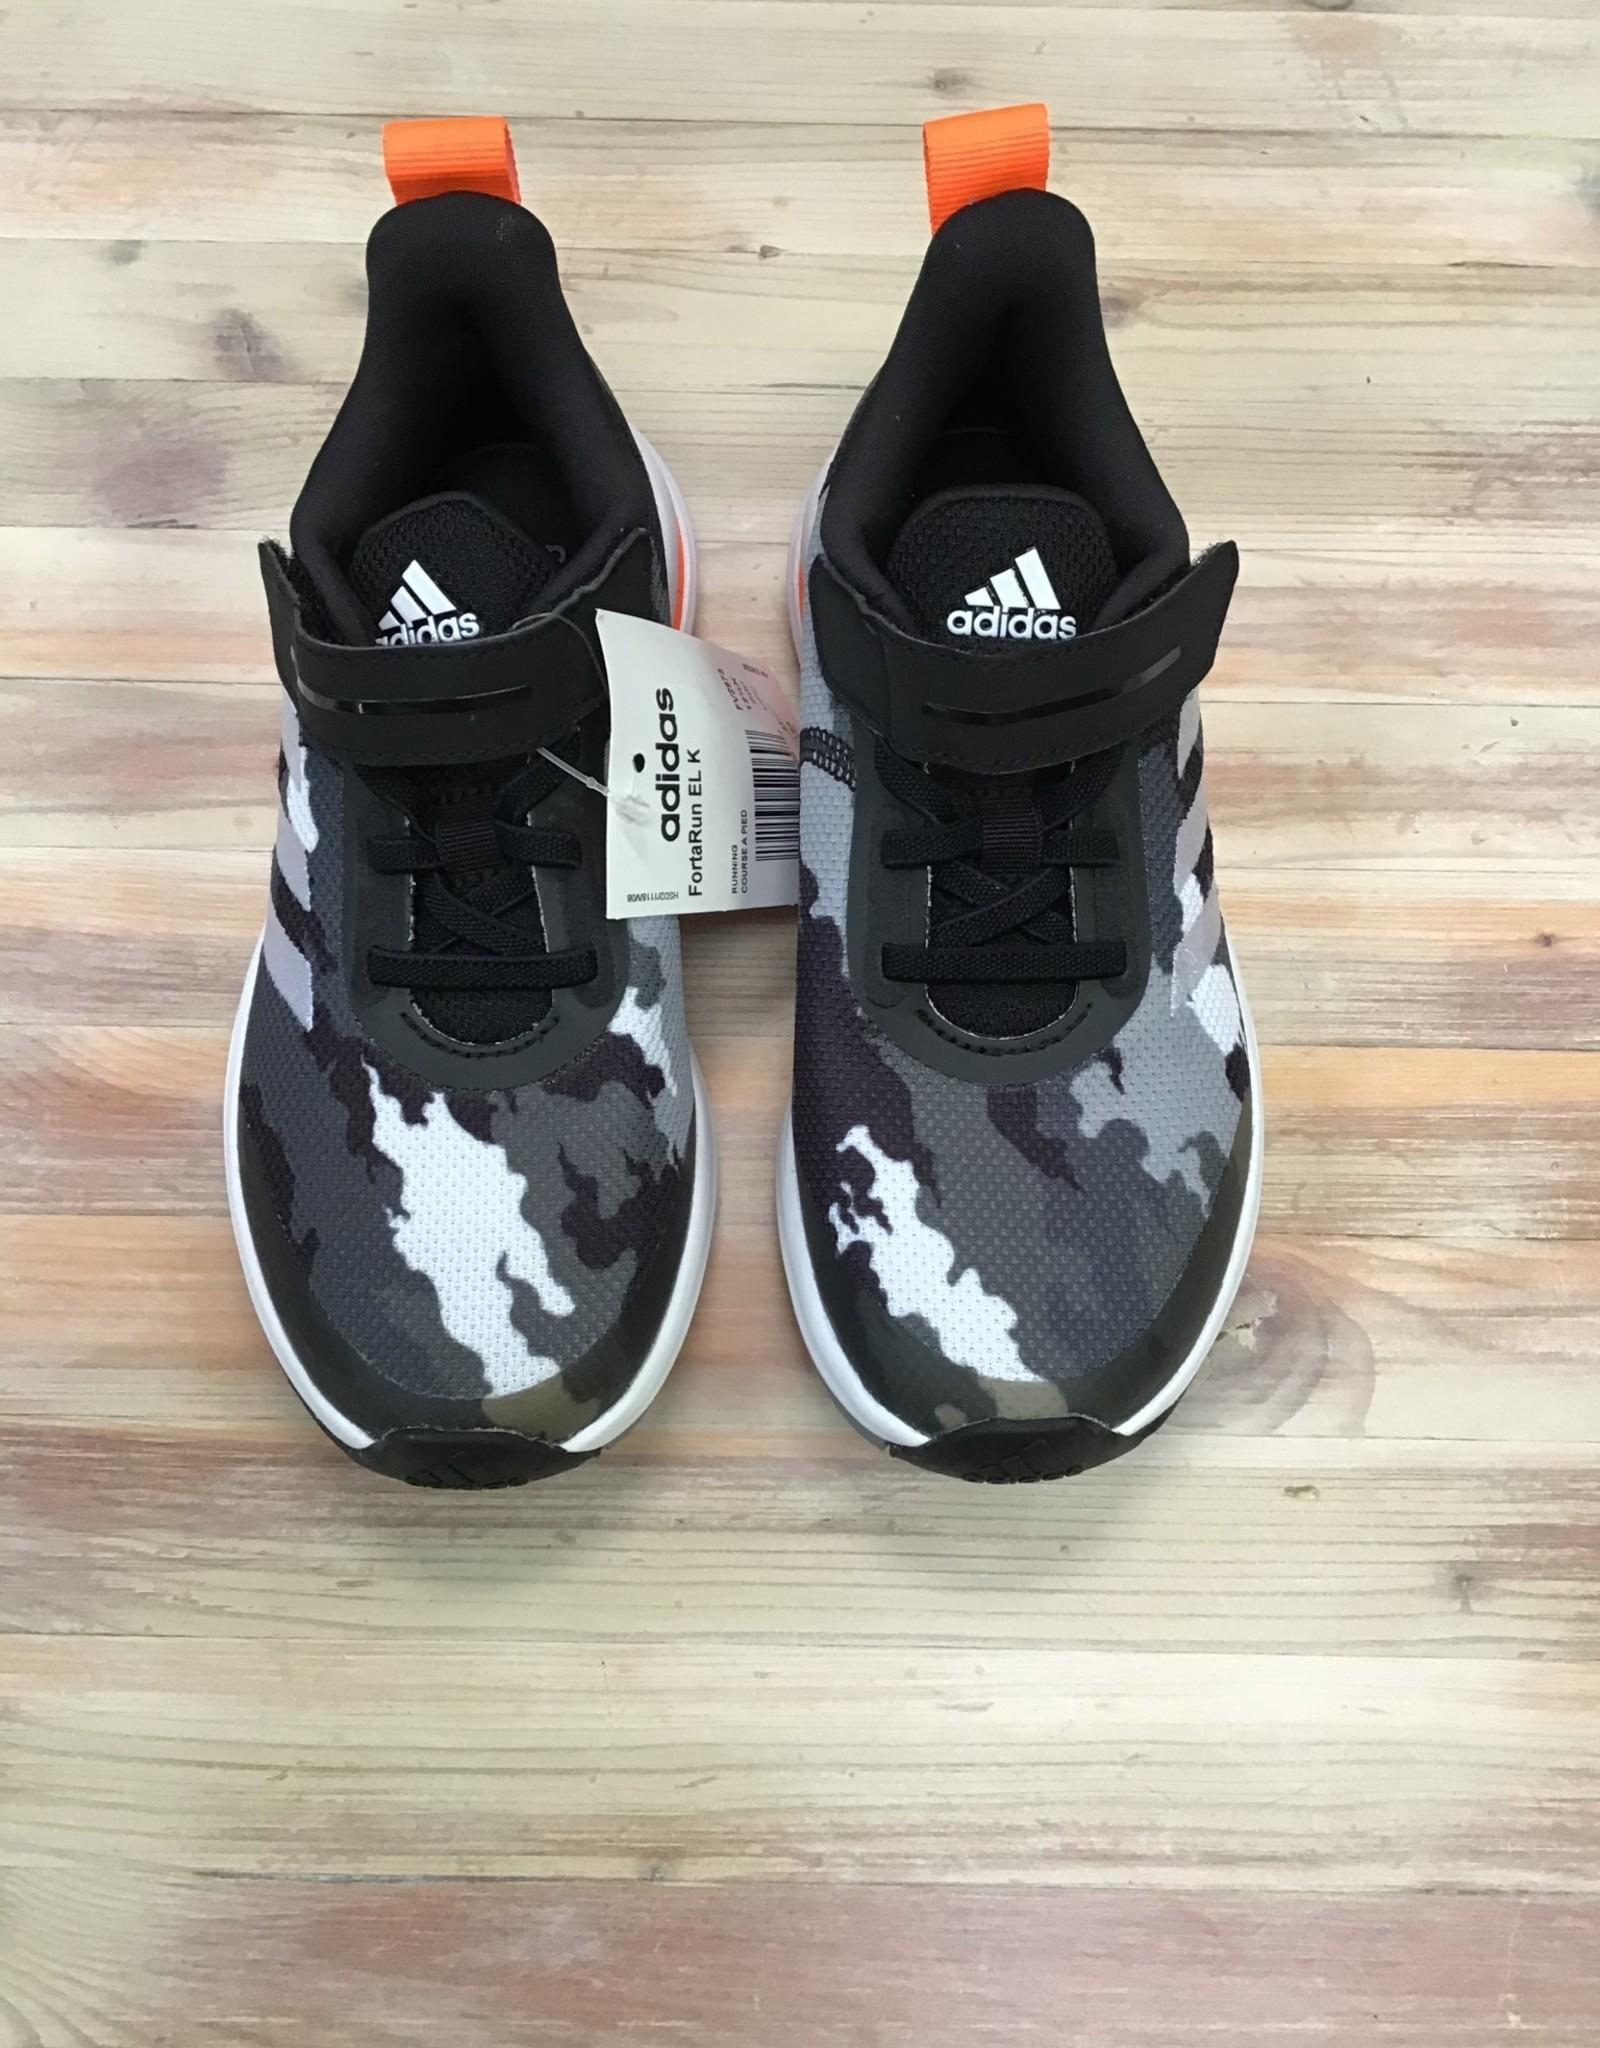 Adidas Adidas Forta Run EL K Kids'